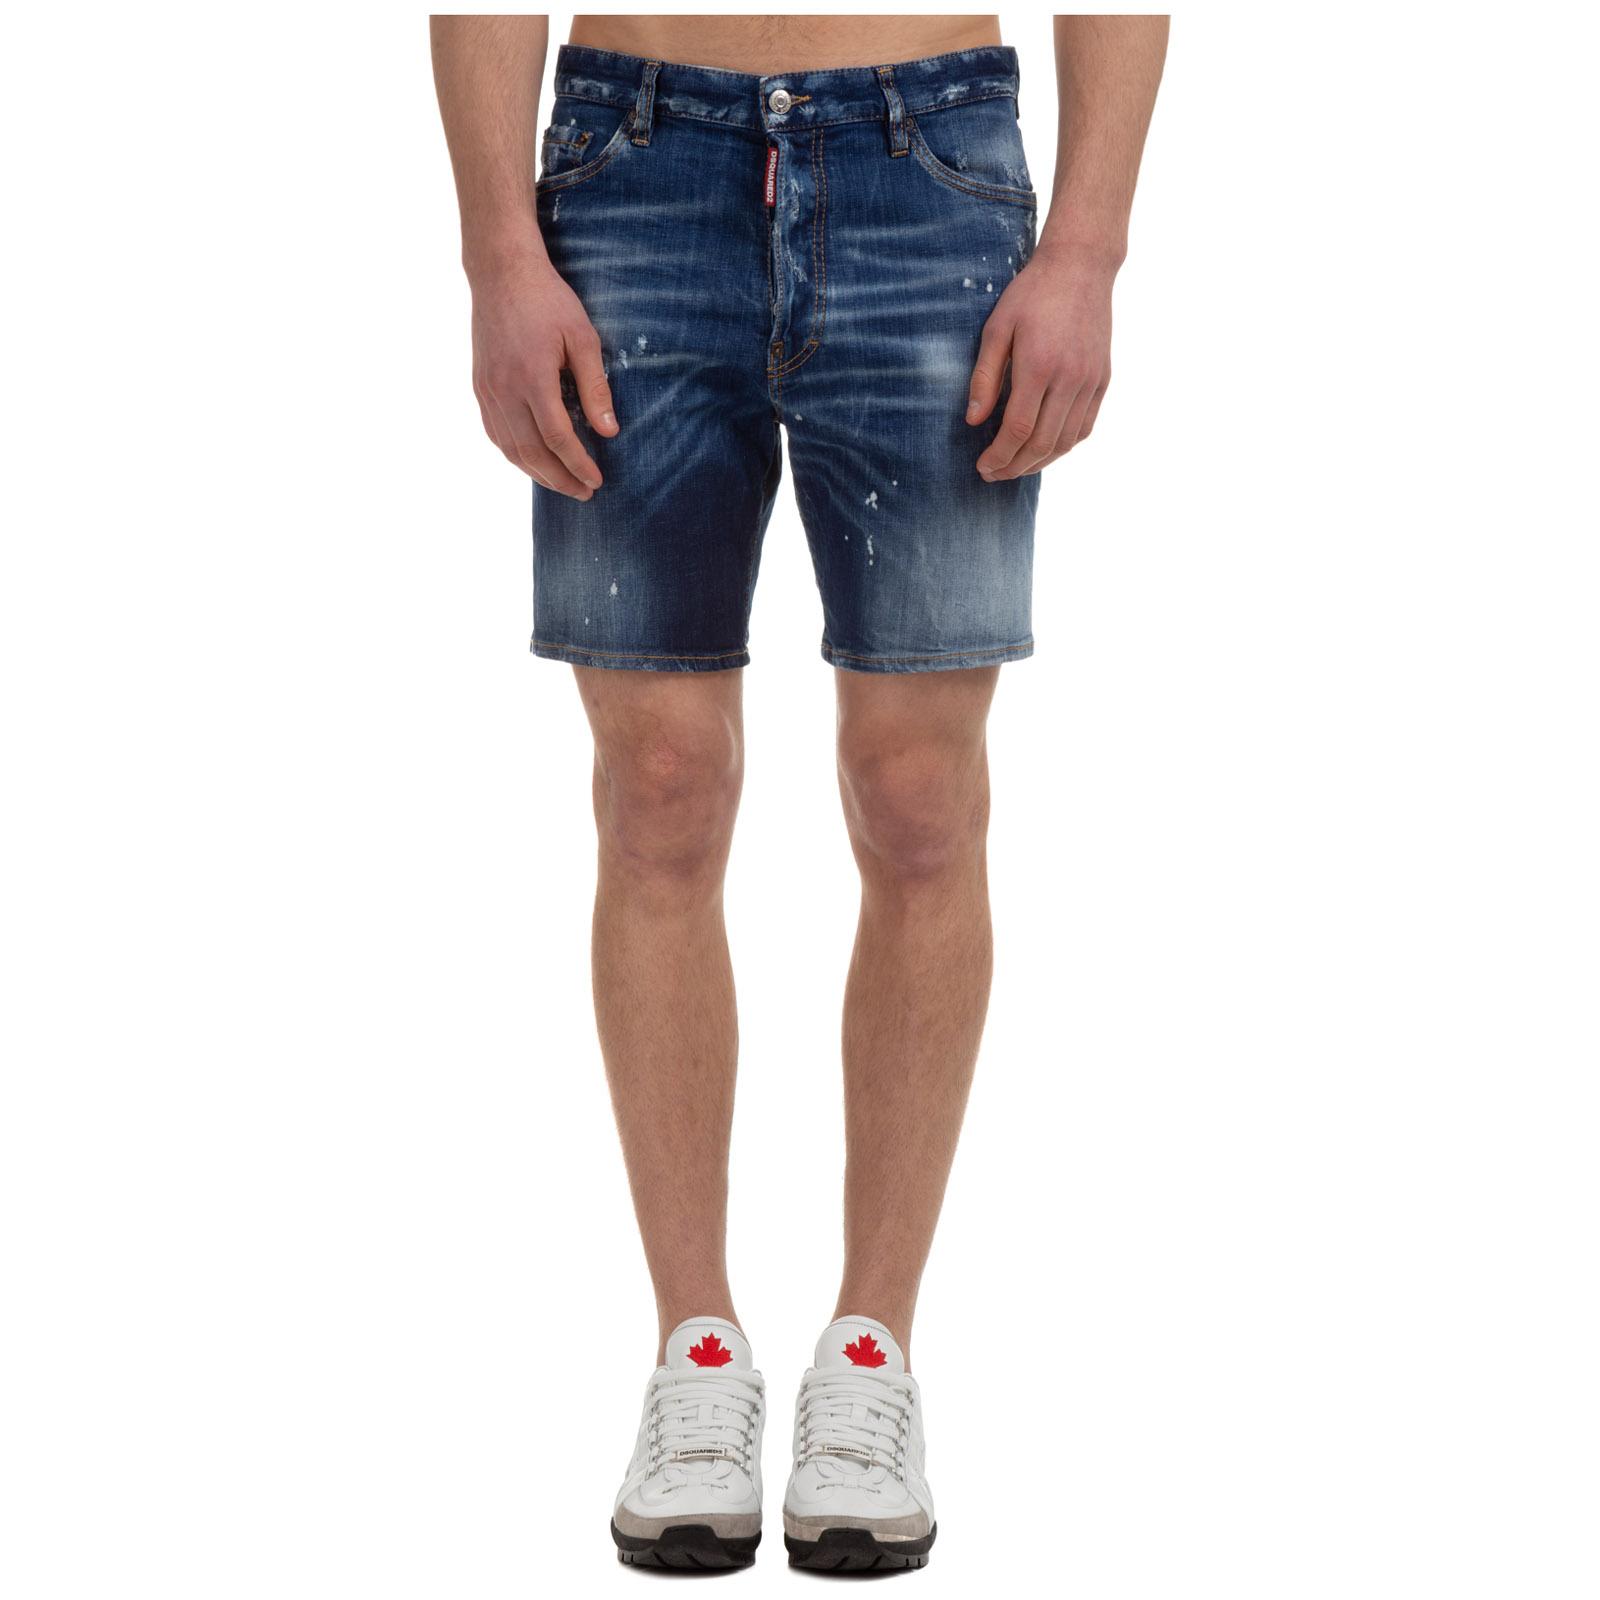 Dsquared2 Shorts MEN'S SHORTS BERMUDA DEAN&DAN